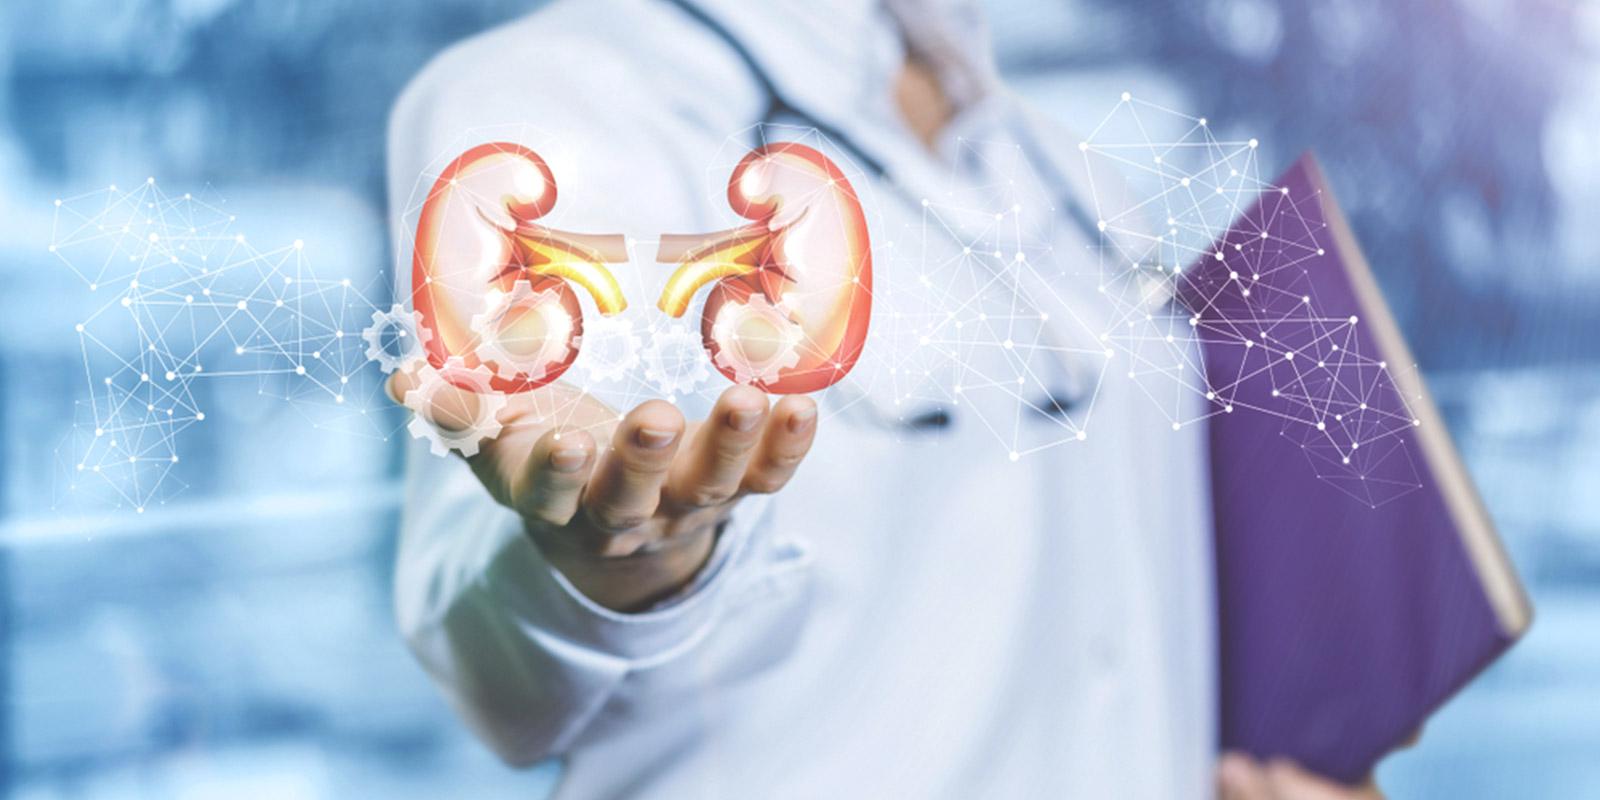 Nephrology (Kidney Disease) Treatment In Iran